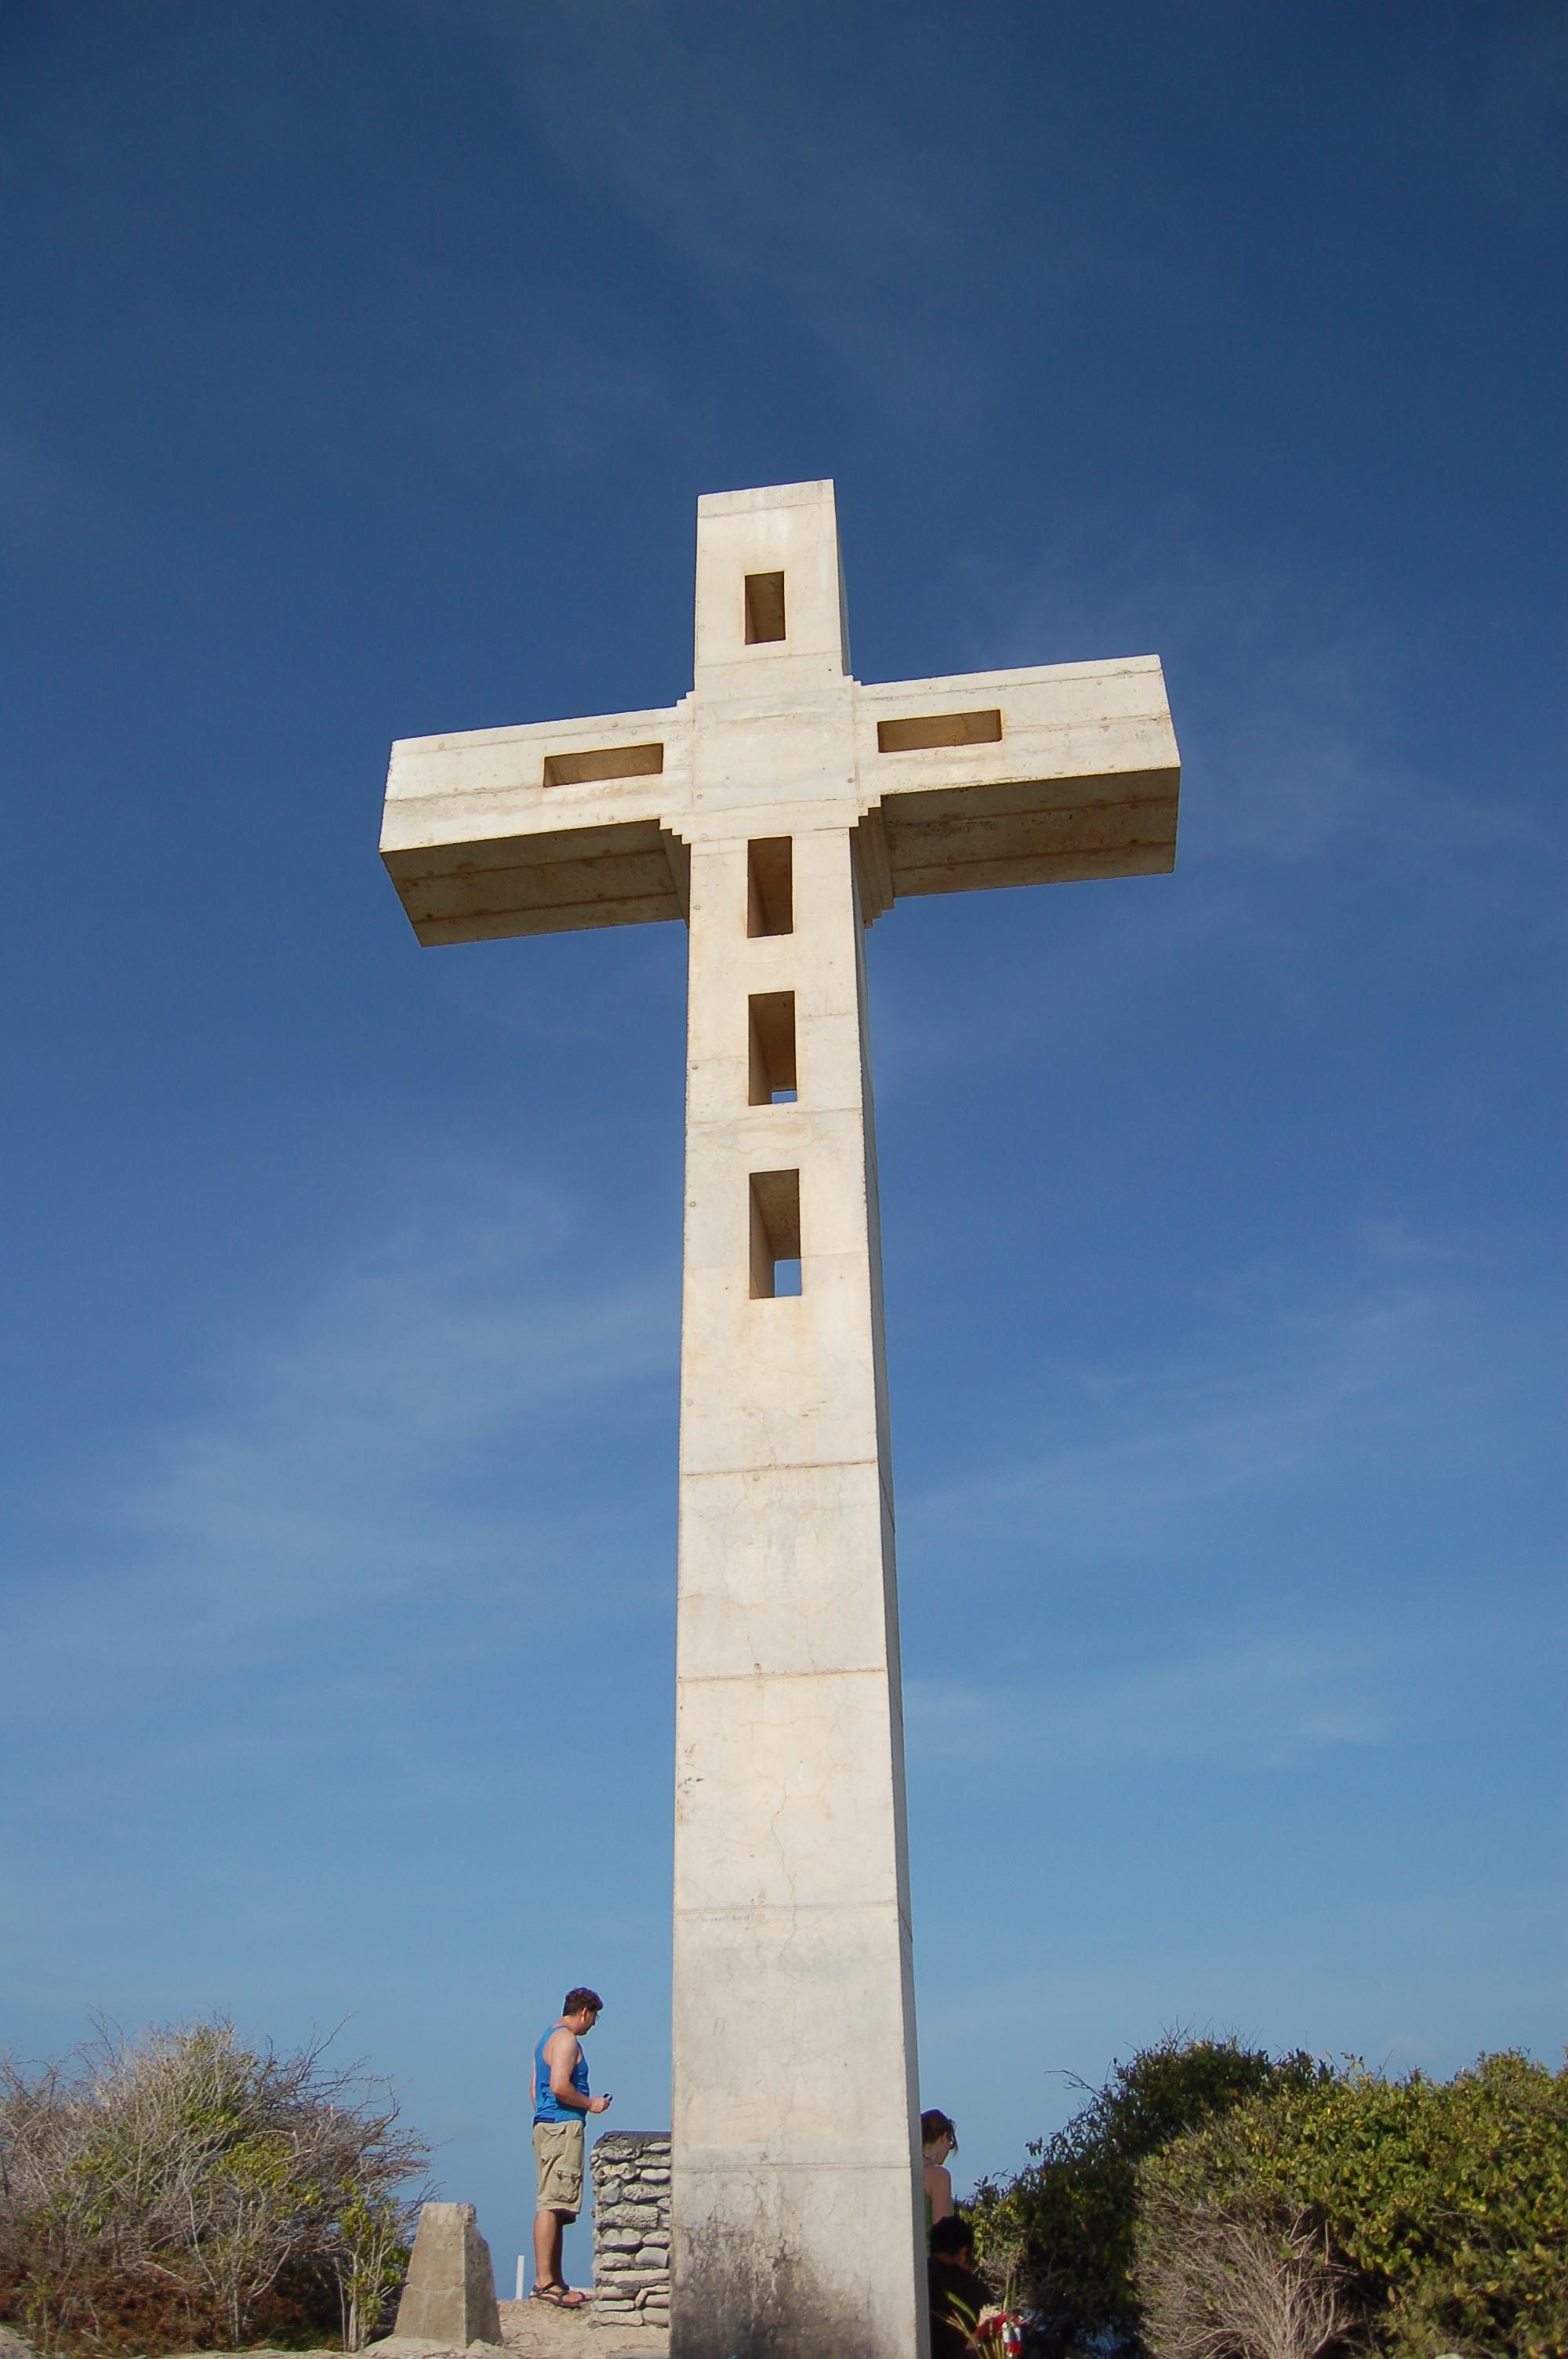 pointe a la croix com history